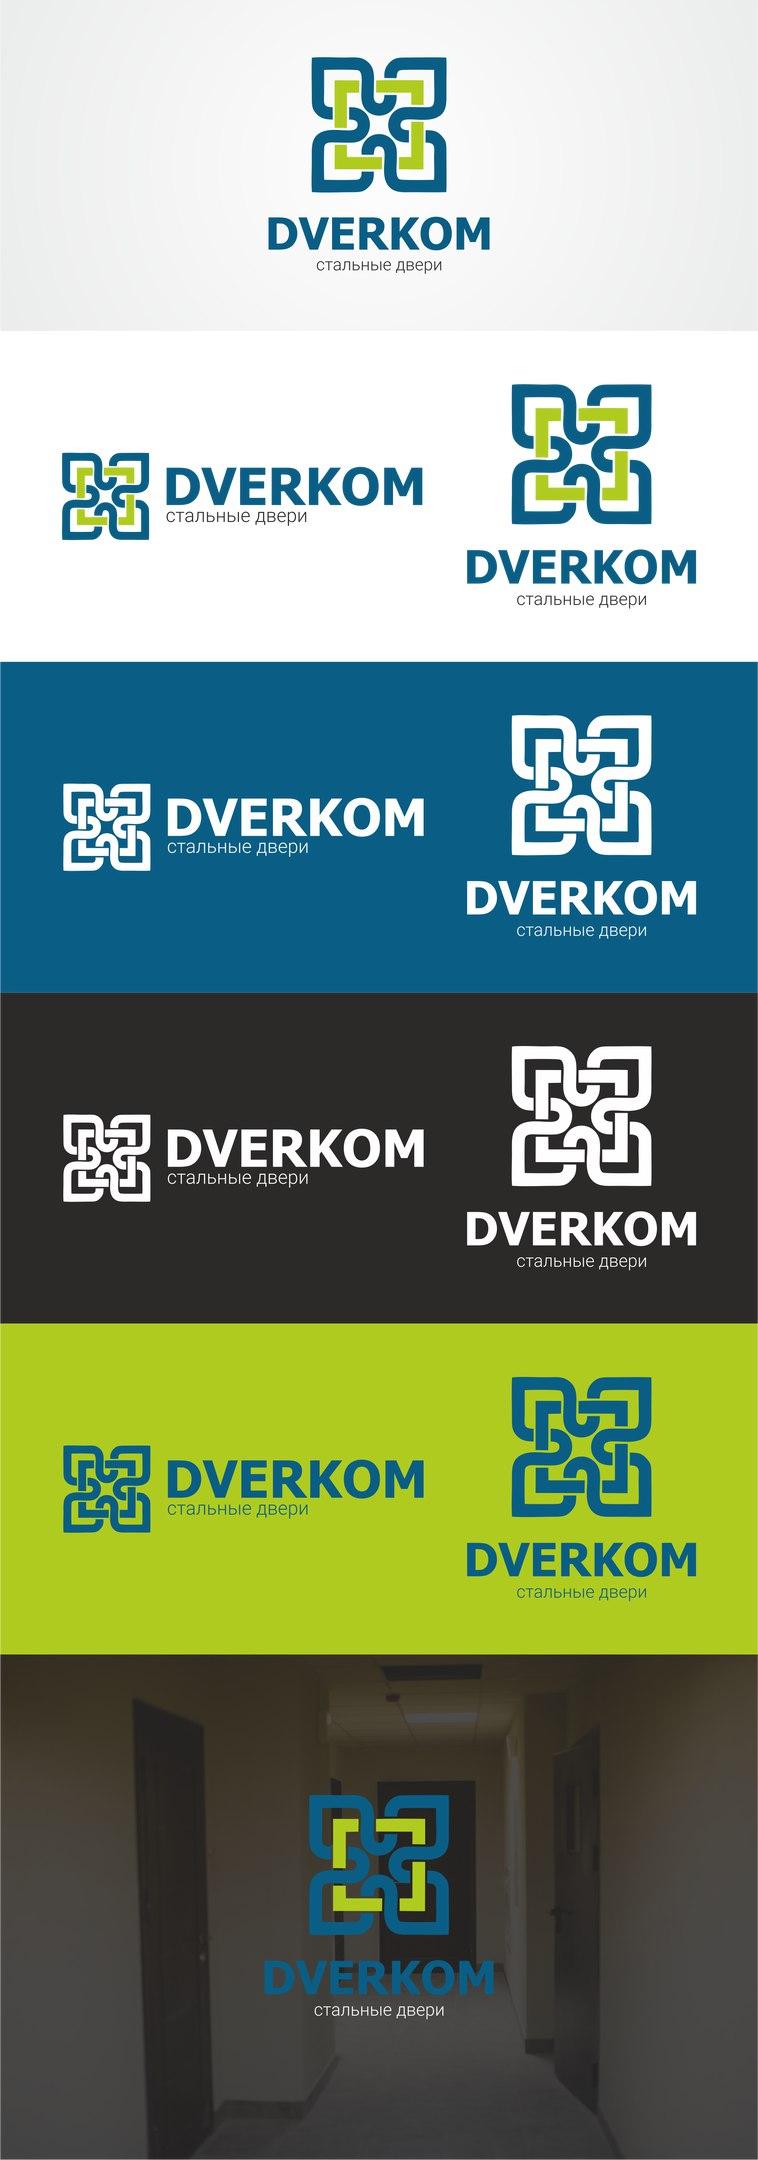 Разработка логотипа DverKom